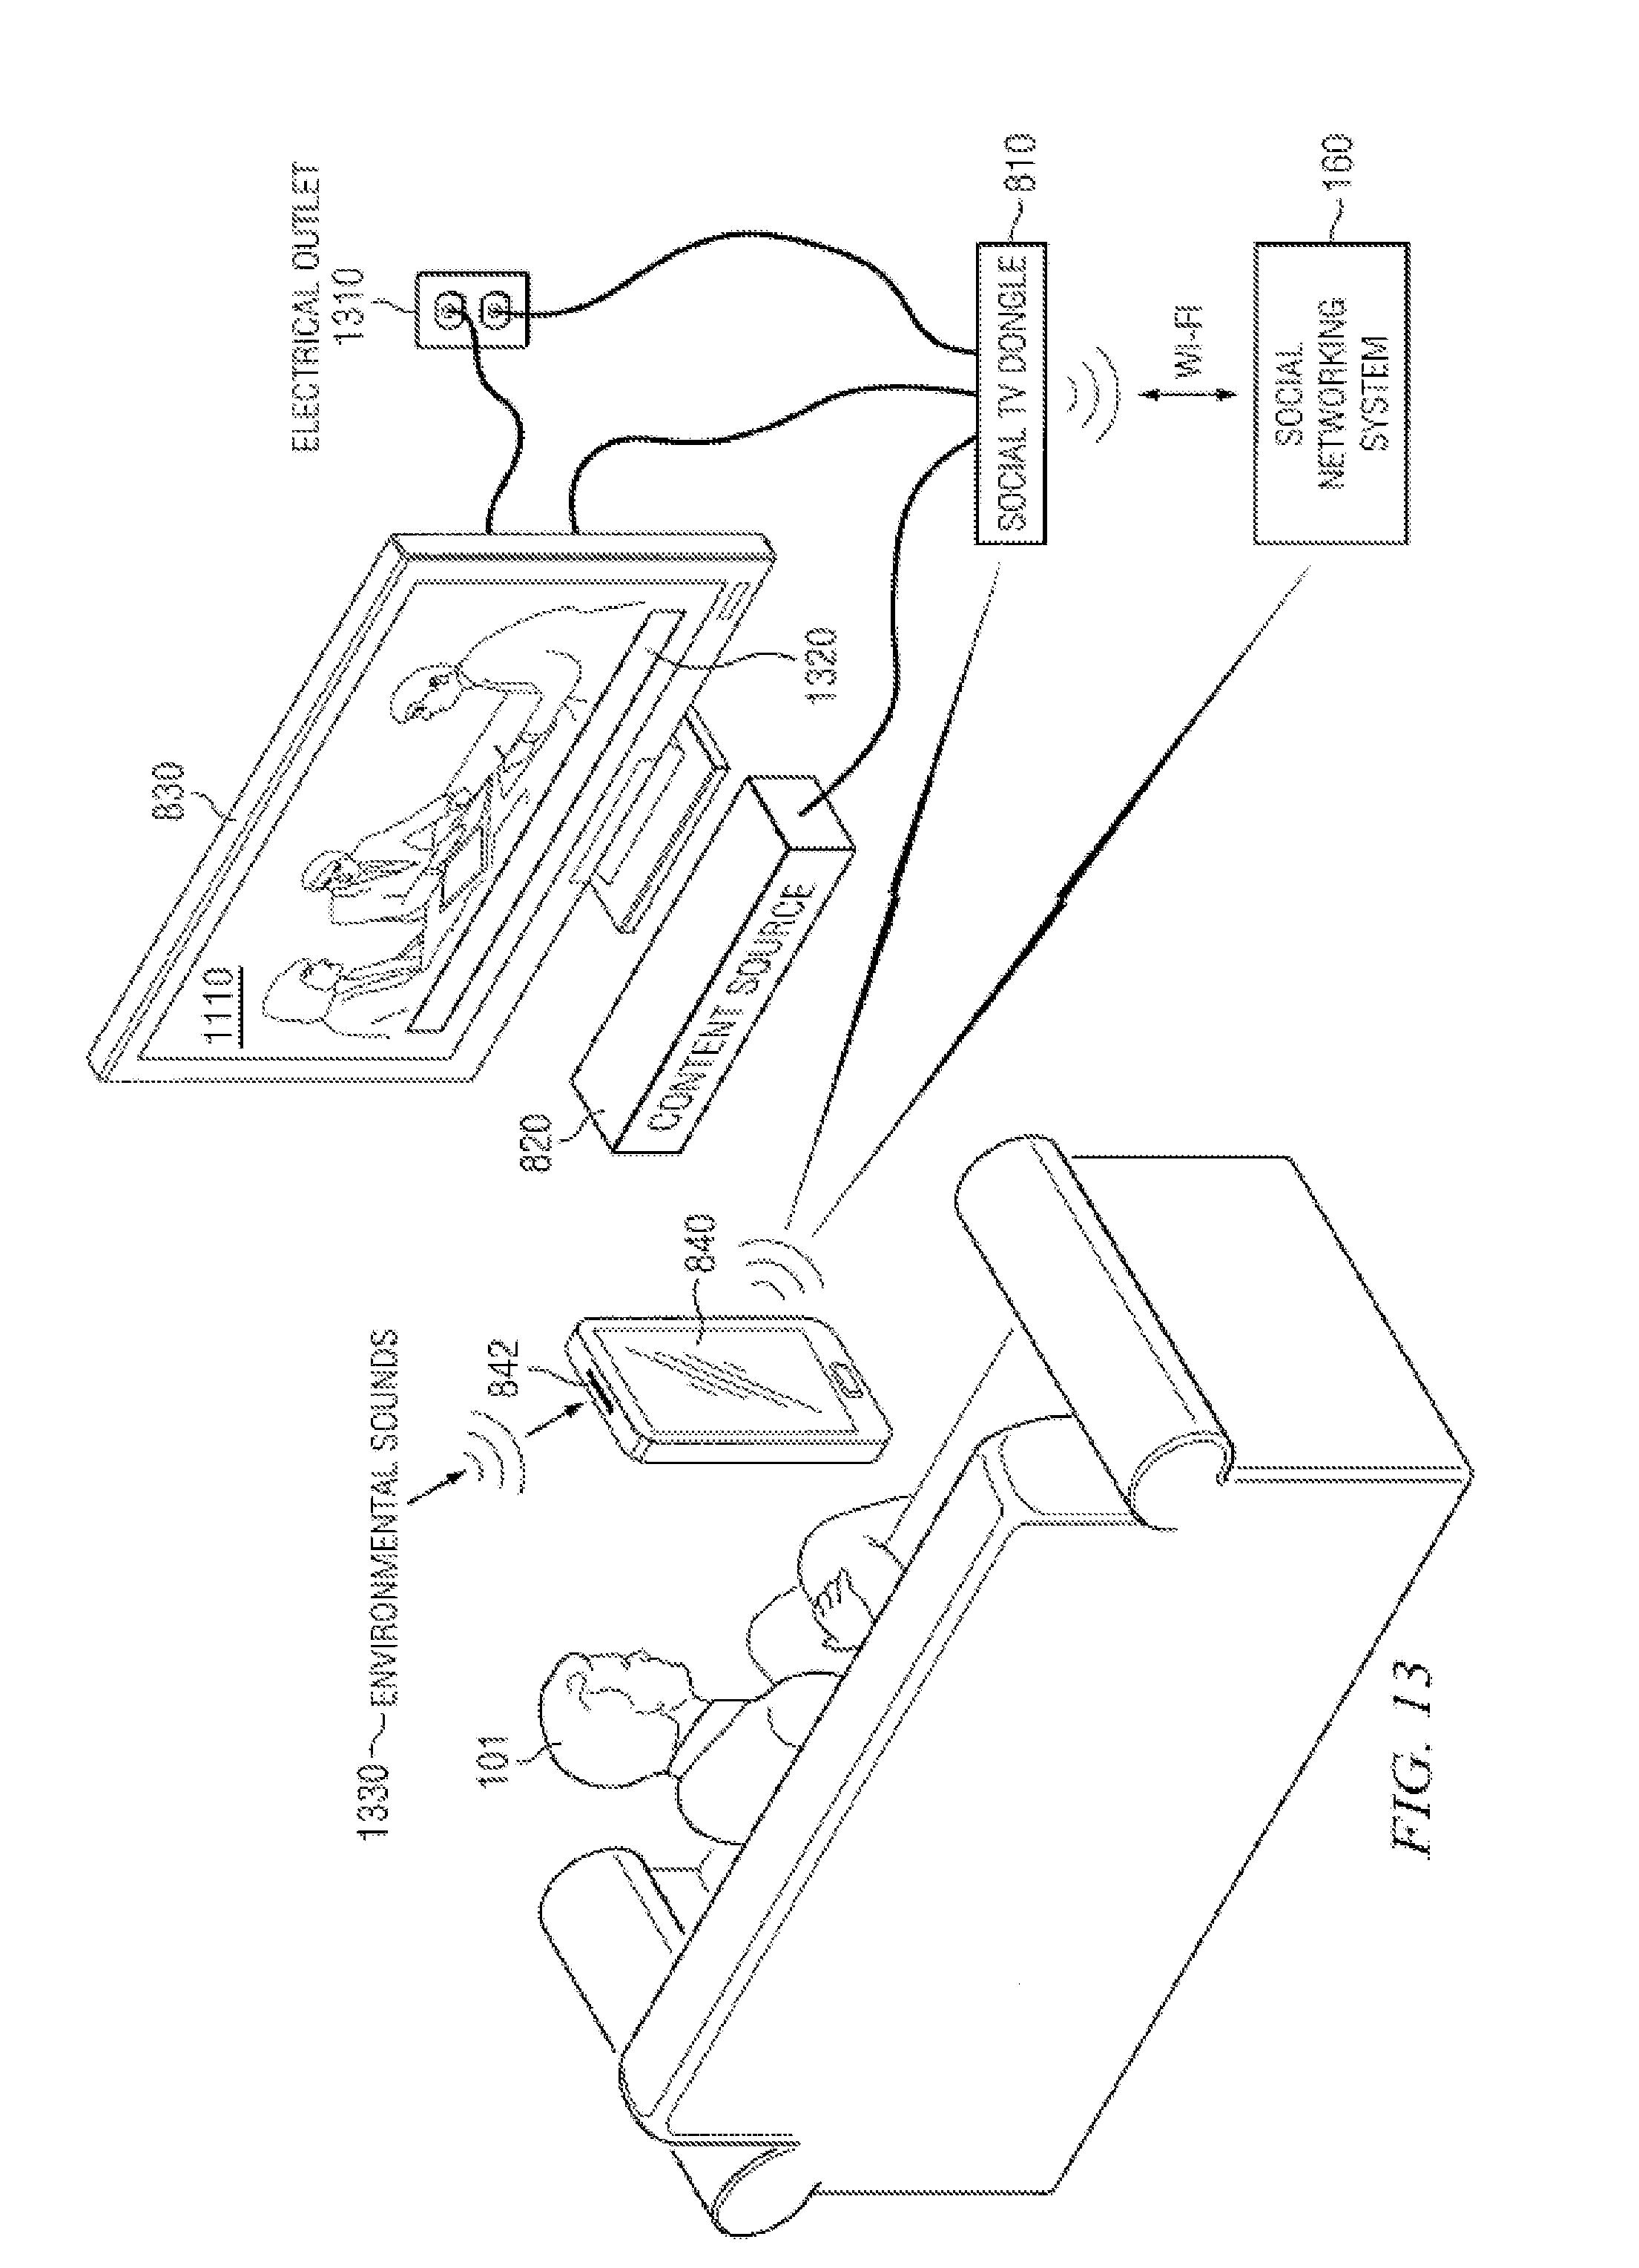 1963 Cadillac Instrument Wiring Diagram Electrical 1973 Schematics Speaker 1964 Galaxie Free Engine Ac 1970